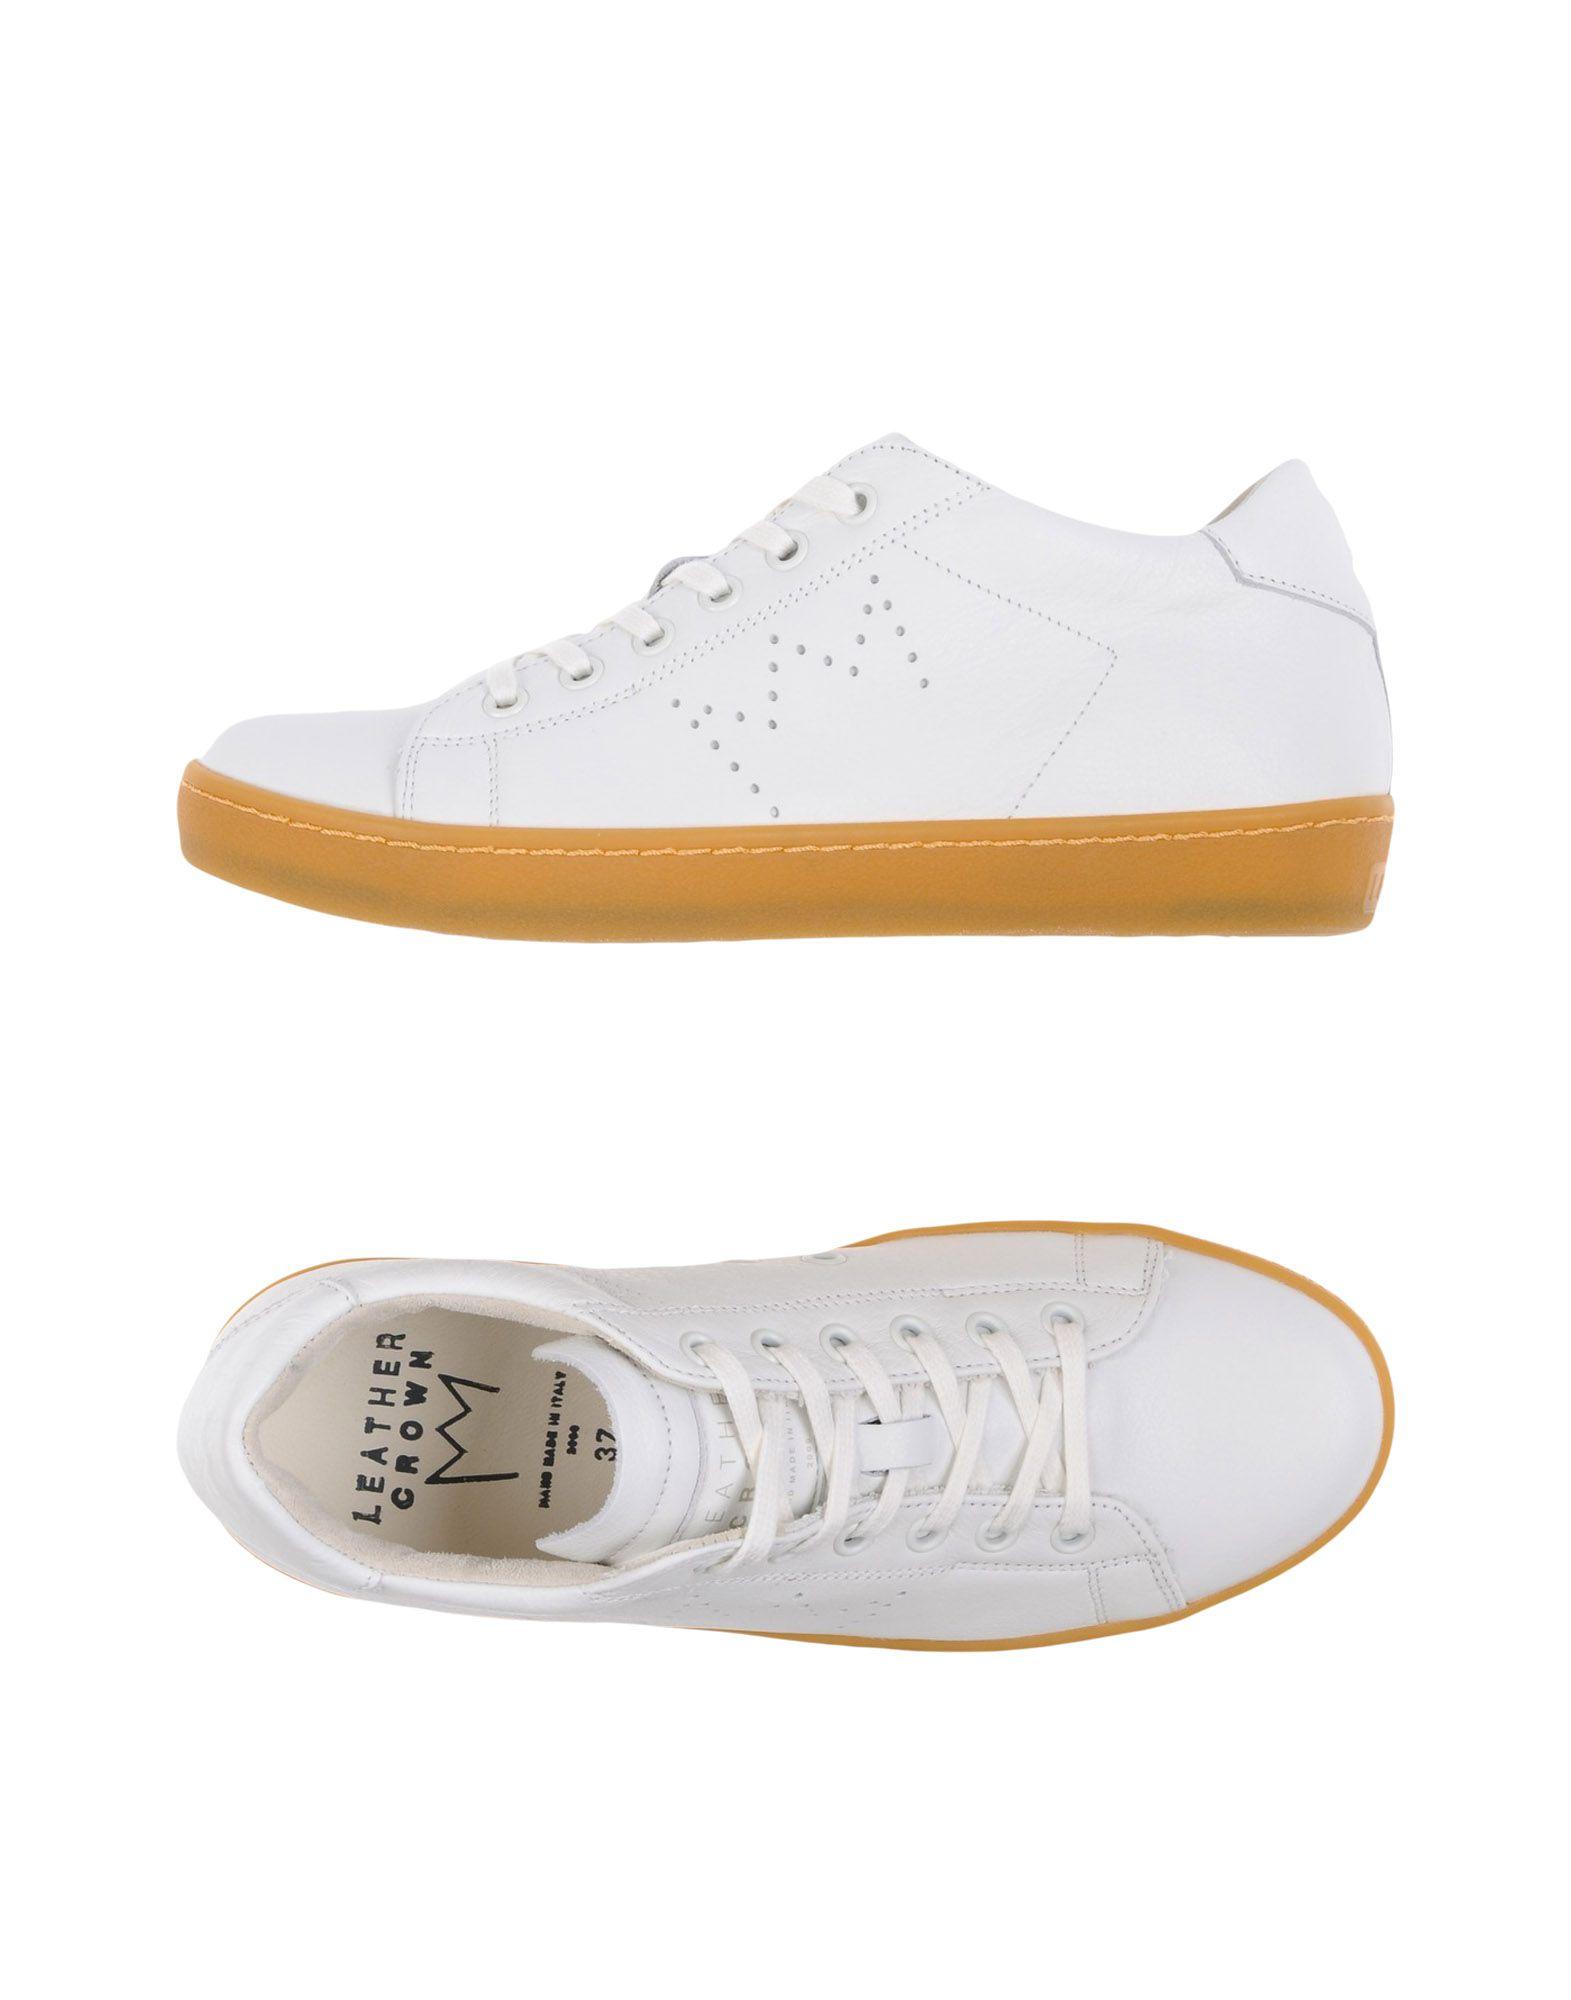 Stilvolle billige Schuhe Schuhe Schuhe Leather Crown Sneakers Damen  11278982PM ddf8b1